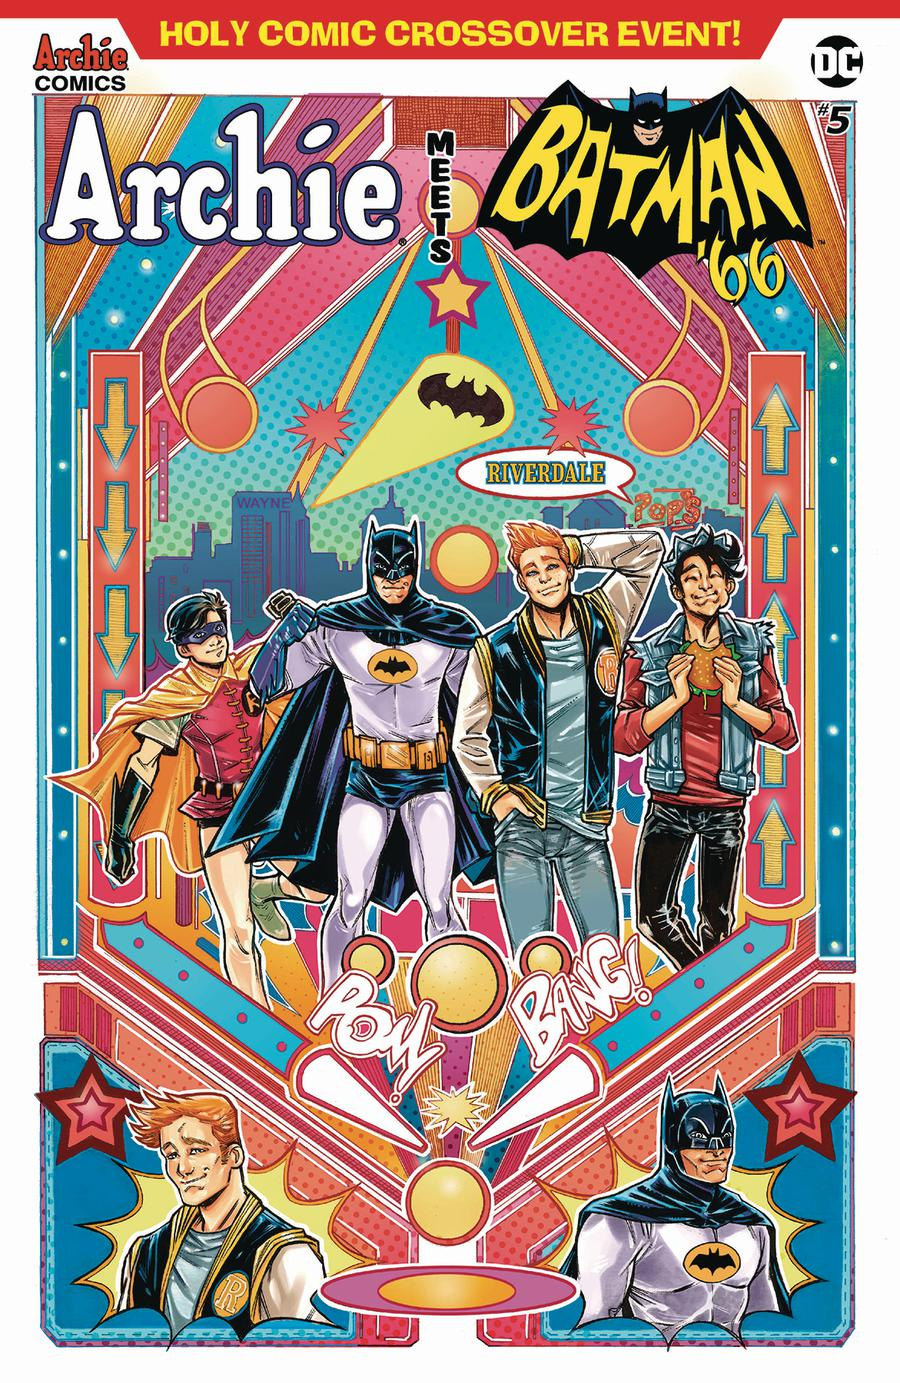 Archie Meets Batman 66 #5 Cover B Variant Laura Braga Cover